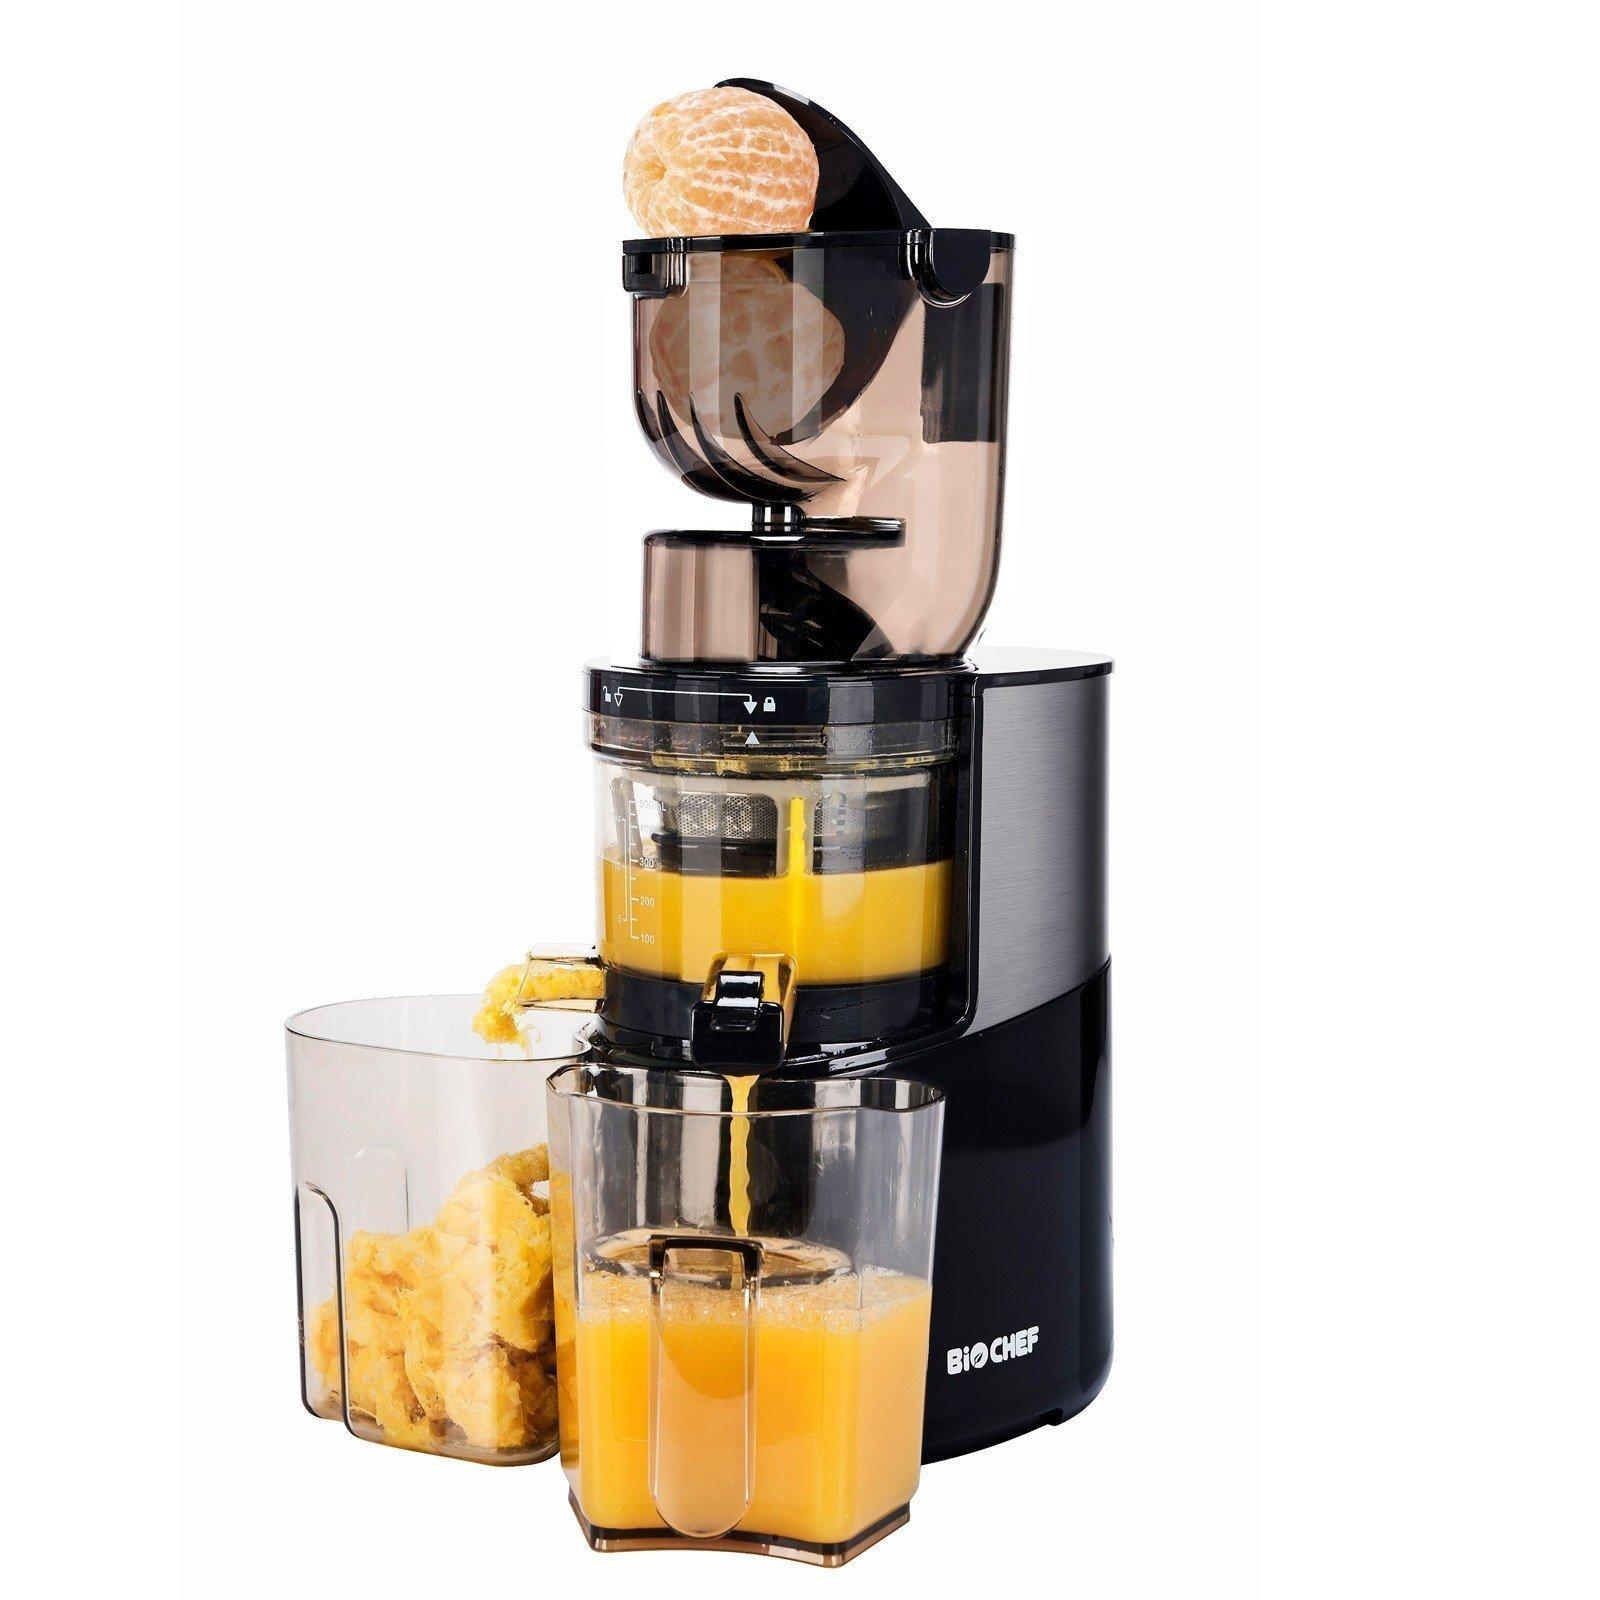 biochef-atlas-whole-pro-orange-juice1600x1600